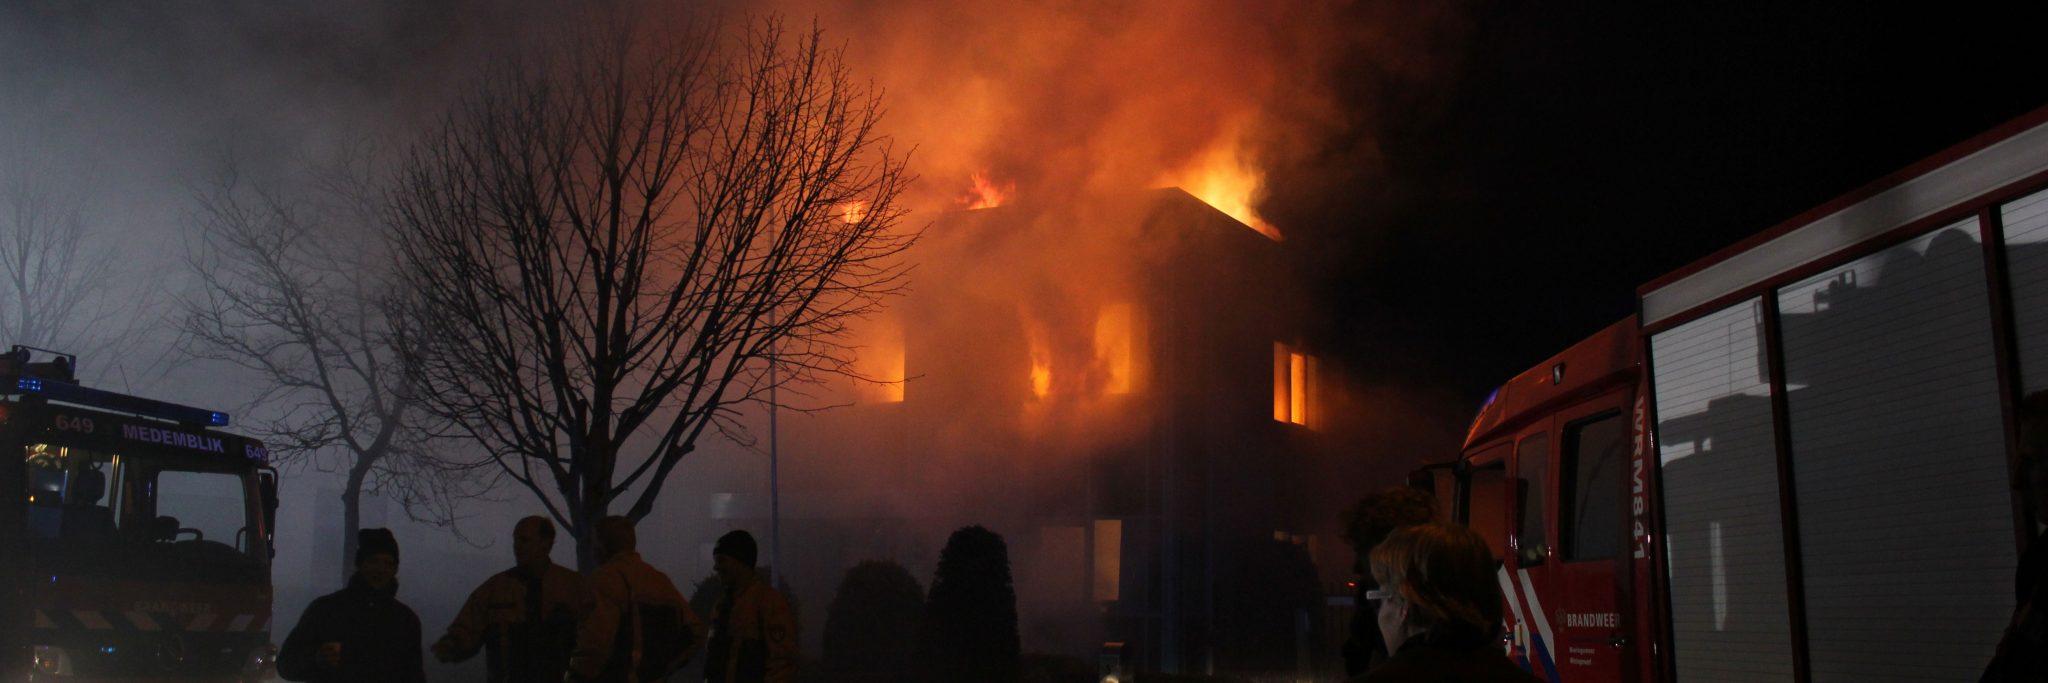 Eigen gebouw in brand